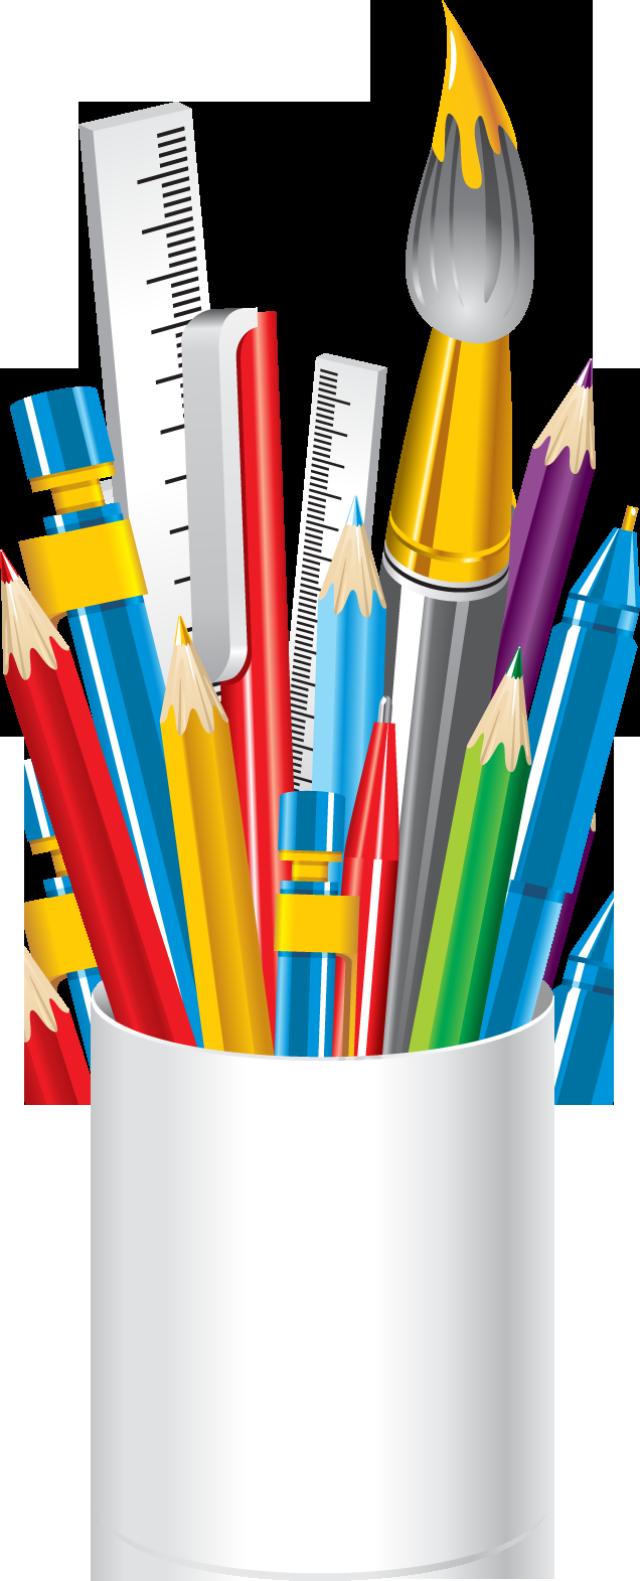 freeuse download Web design development clip. 7 clipart pencil crayon